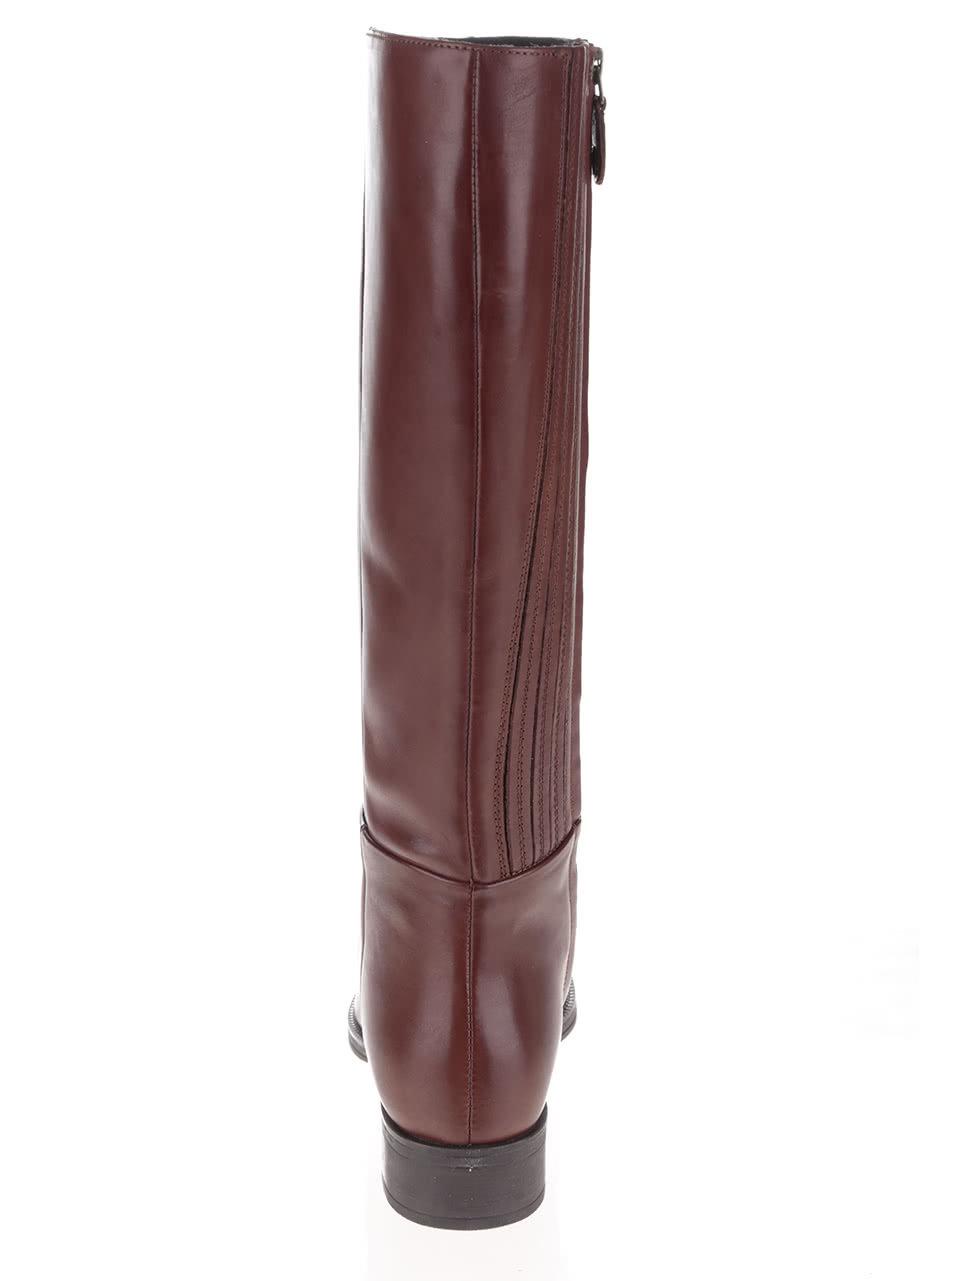 Hnedé vysoké čižmy s detailmi Geox Donna Mendit ... adf852c1703